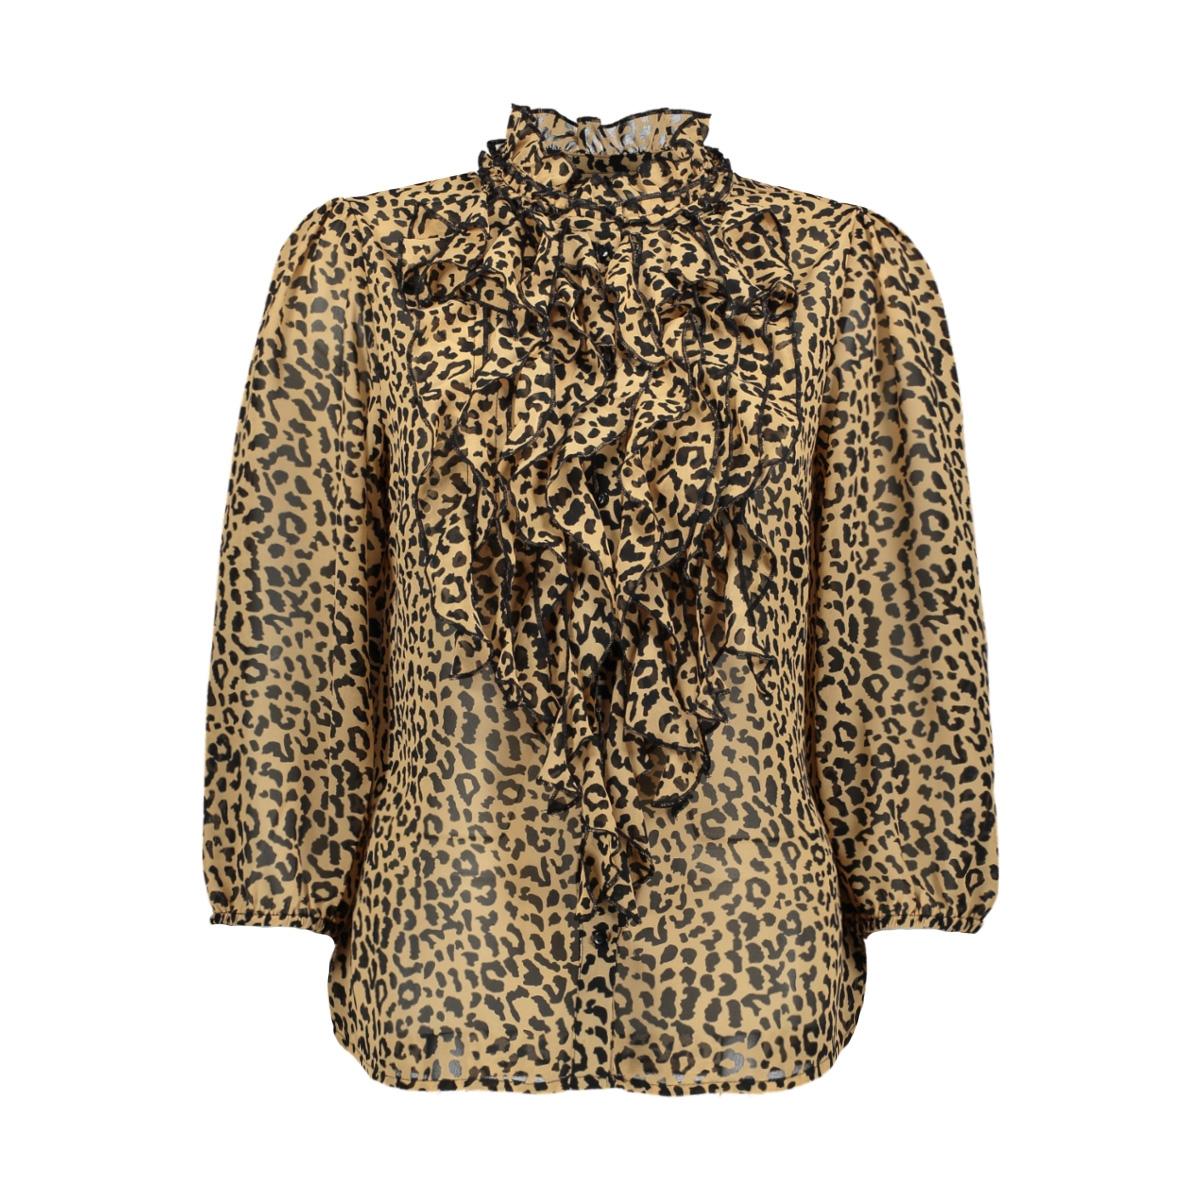 lilly ss top batik 30510388 saint tropez blouse 19 3911 black beauty leopard